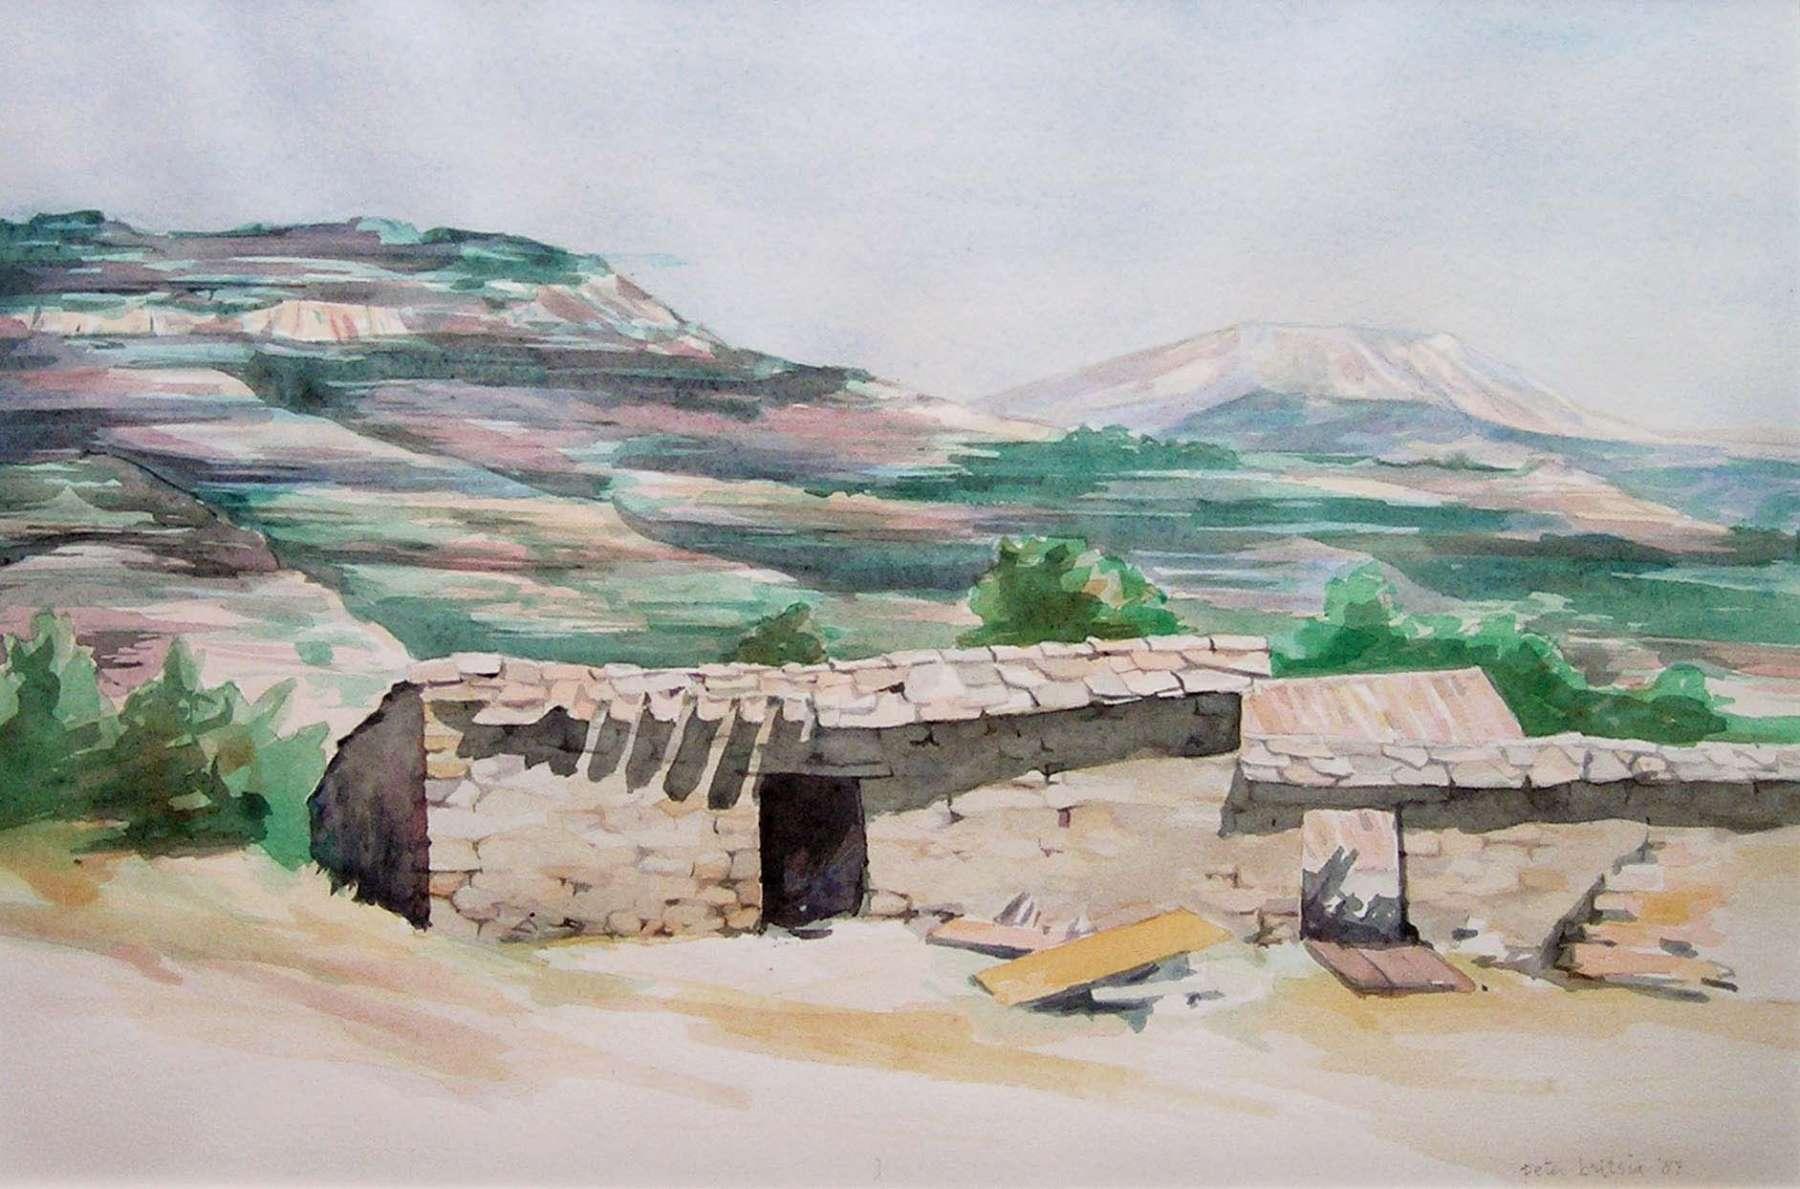 Oude schuur - Spaanse Pyreneeën - aquarel - 40 x 30 cm.